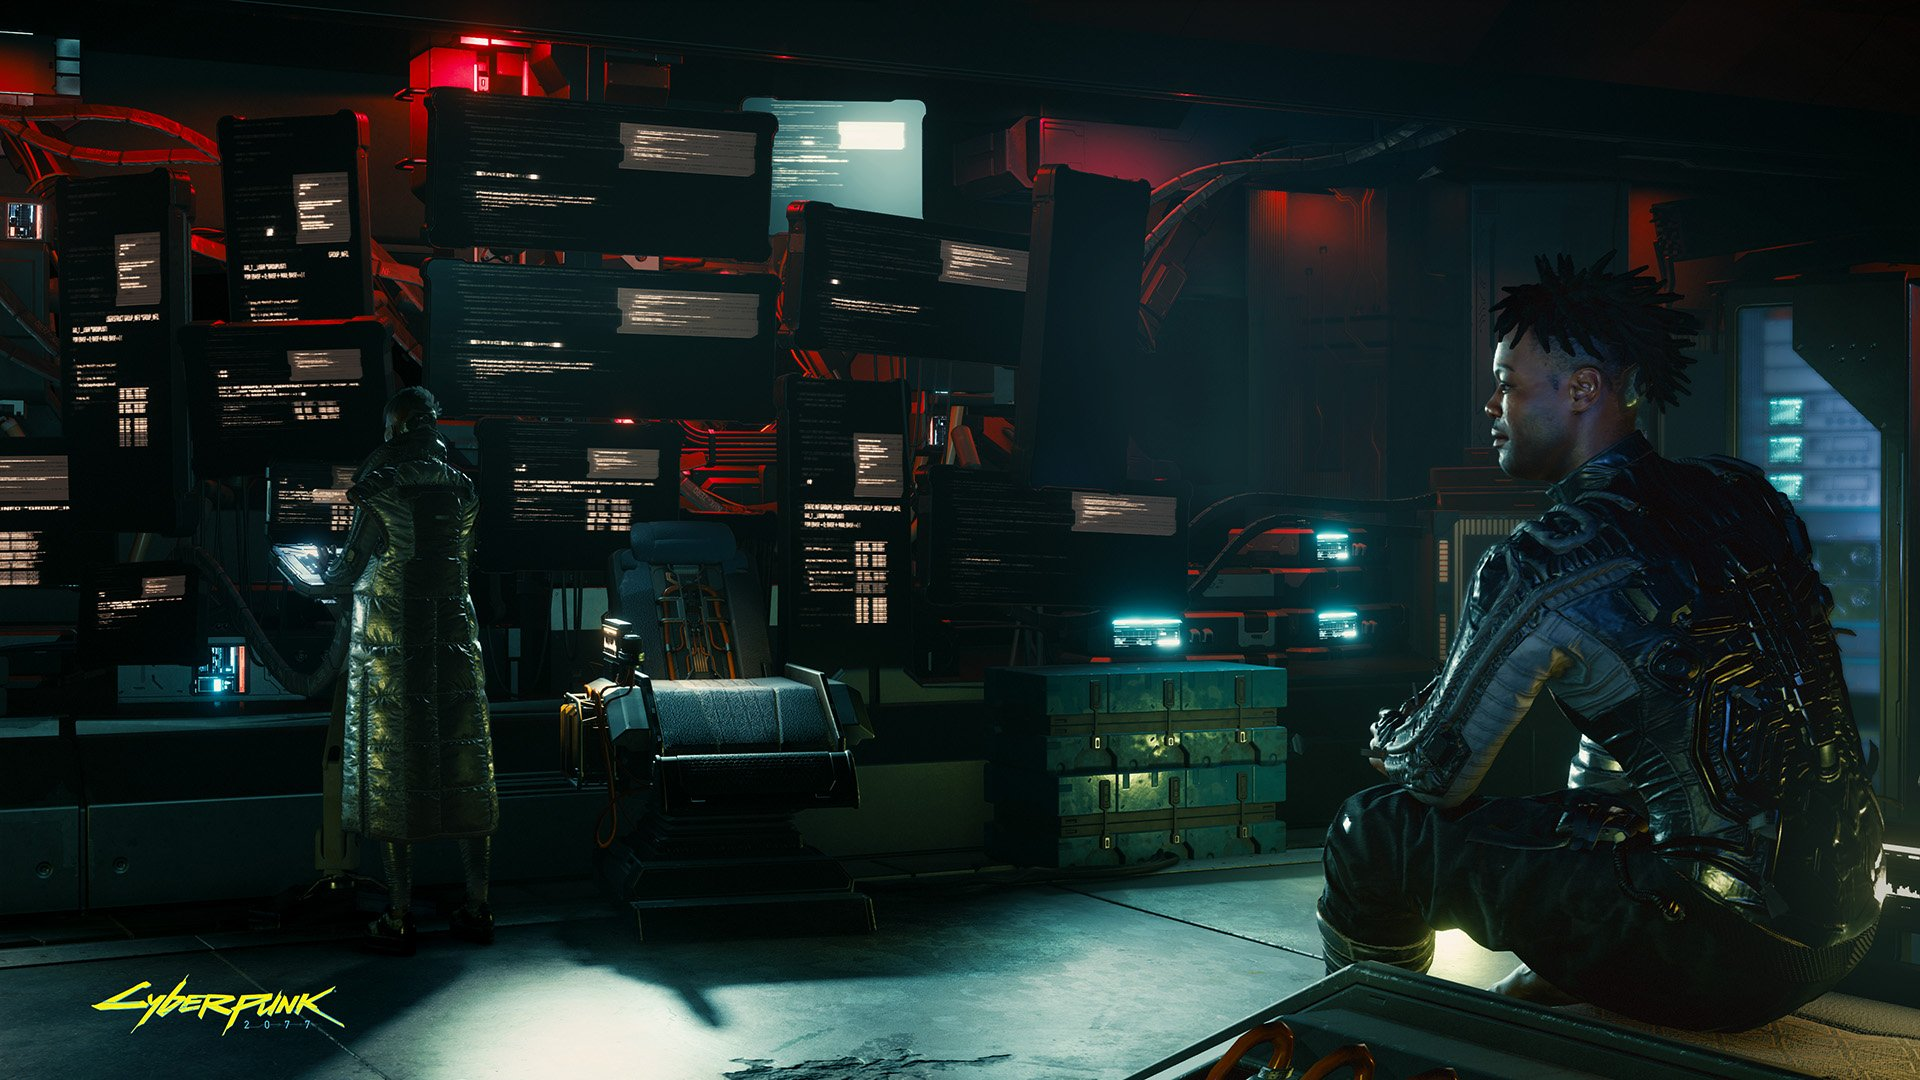 CDPR reveals two new screenshots from Cyberpunk 2077